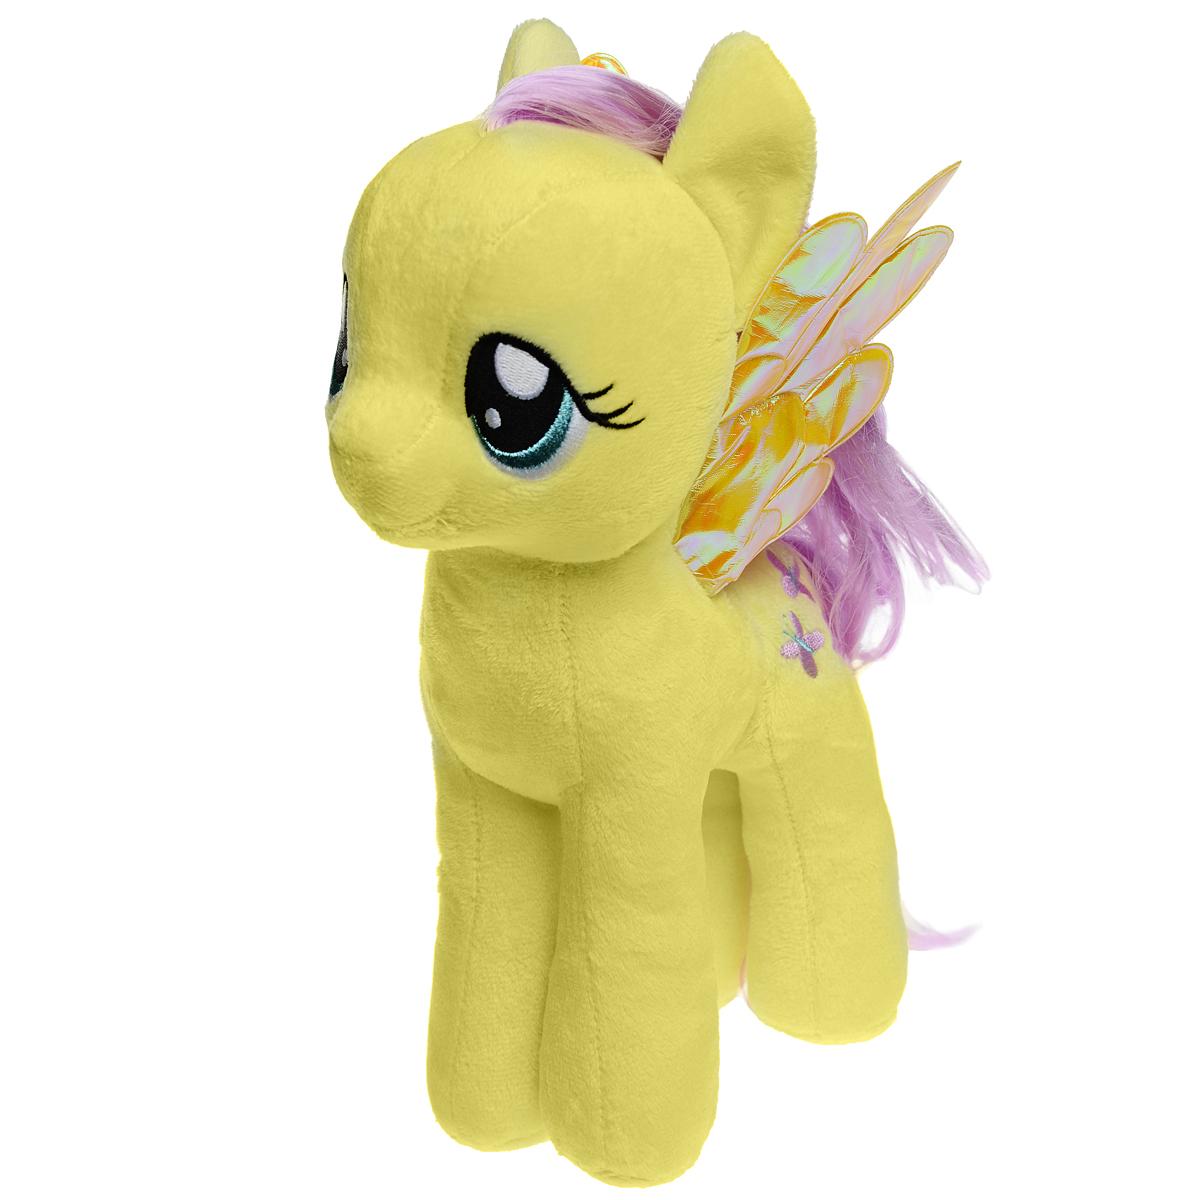 My Little Pony. Мягкая игрушка Пони Fluttershy, 30 см мульти пульти мягкая игрушка принцесса луна 18 см со звуком my little pony мульти пульти